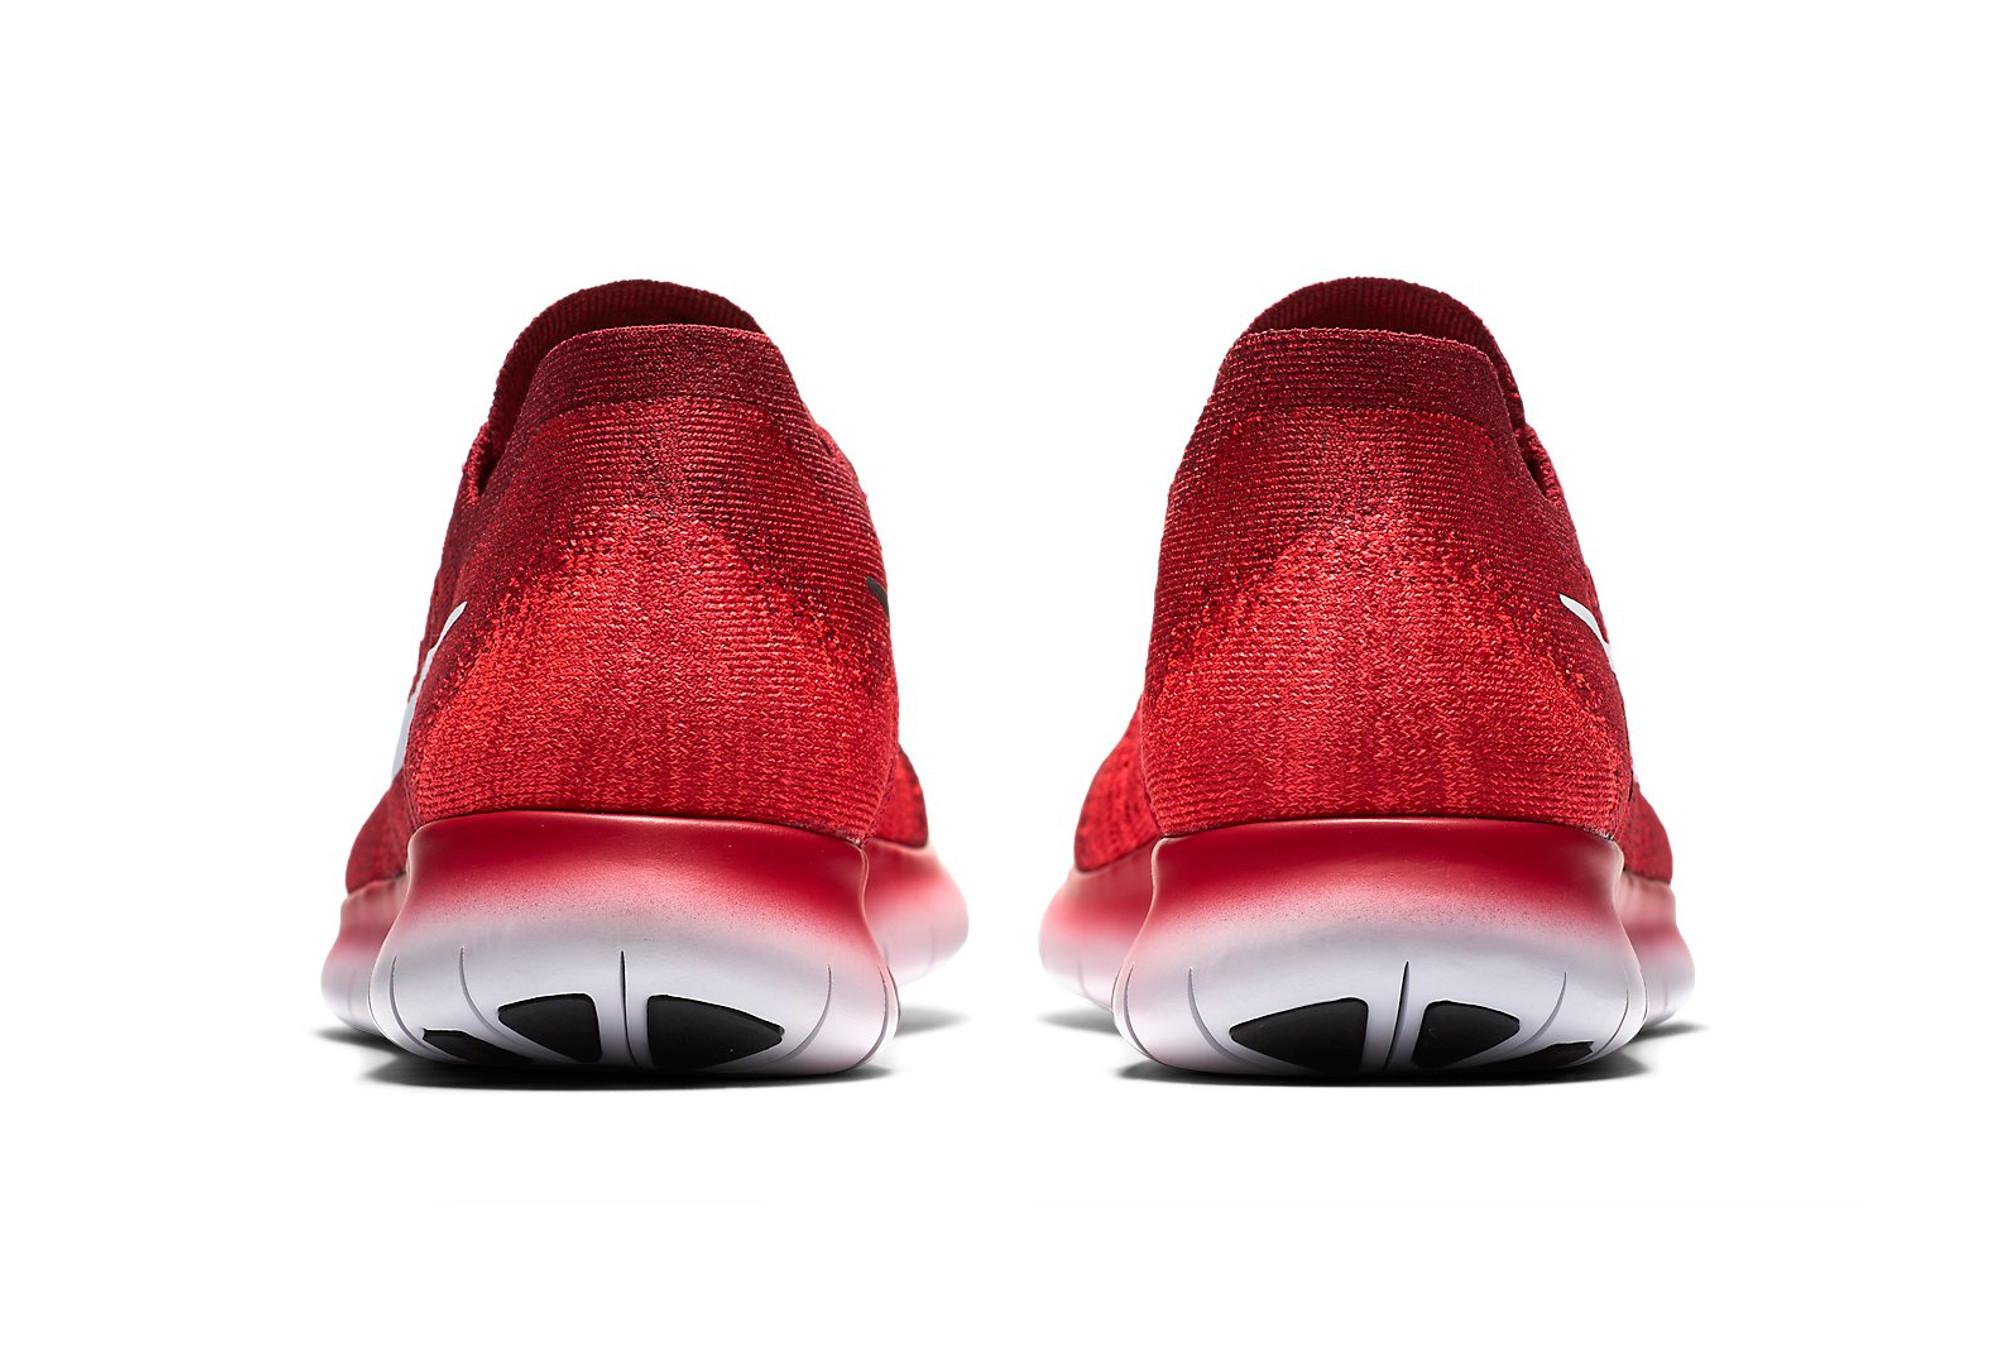 Nike Free Run Flyknit Schuh Rot Weiß Herren